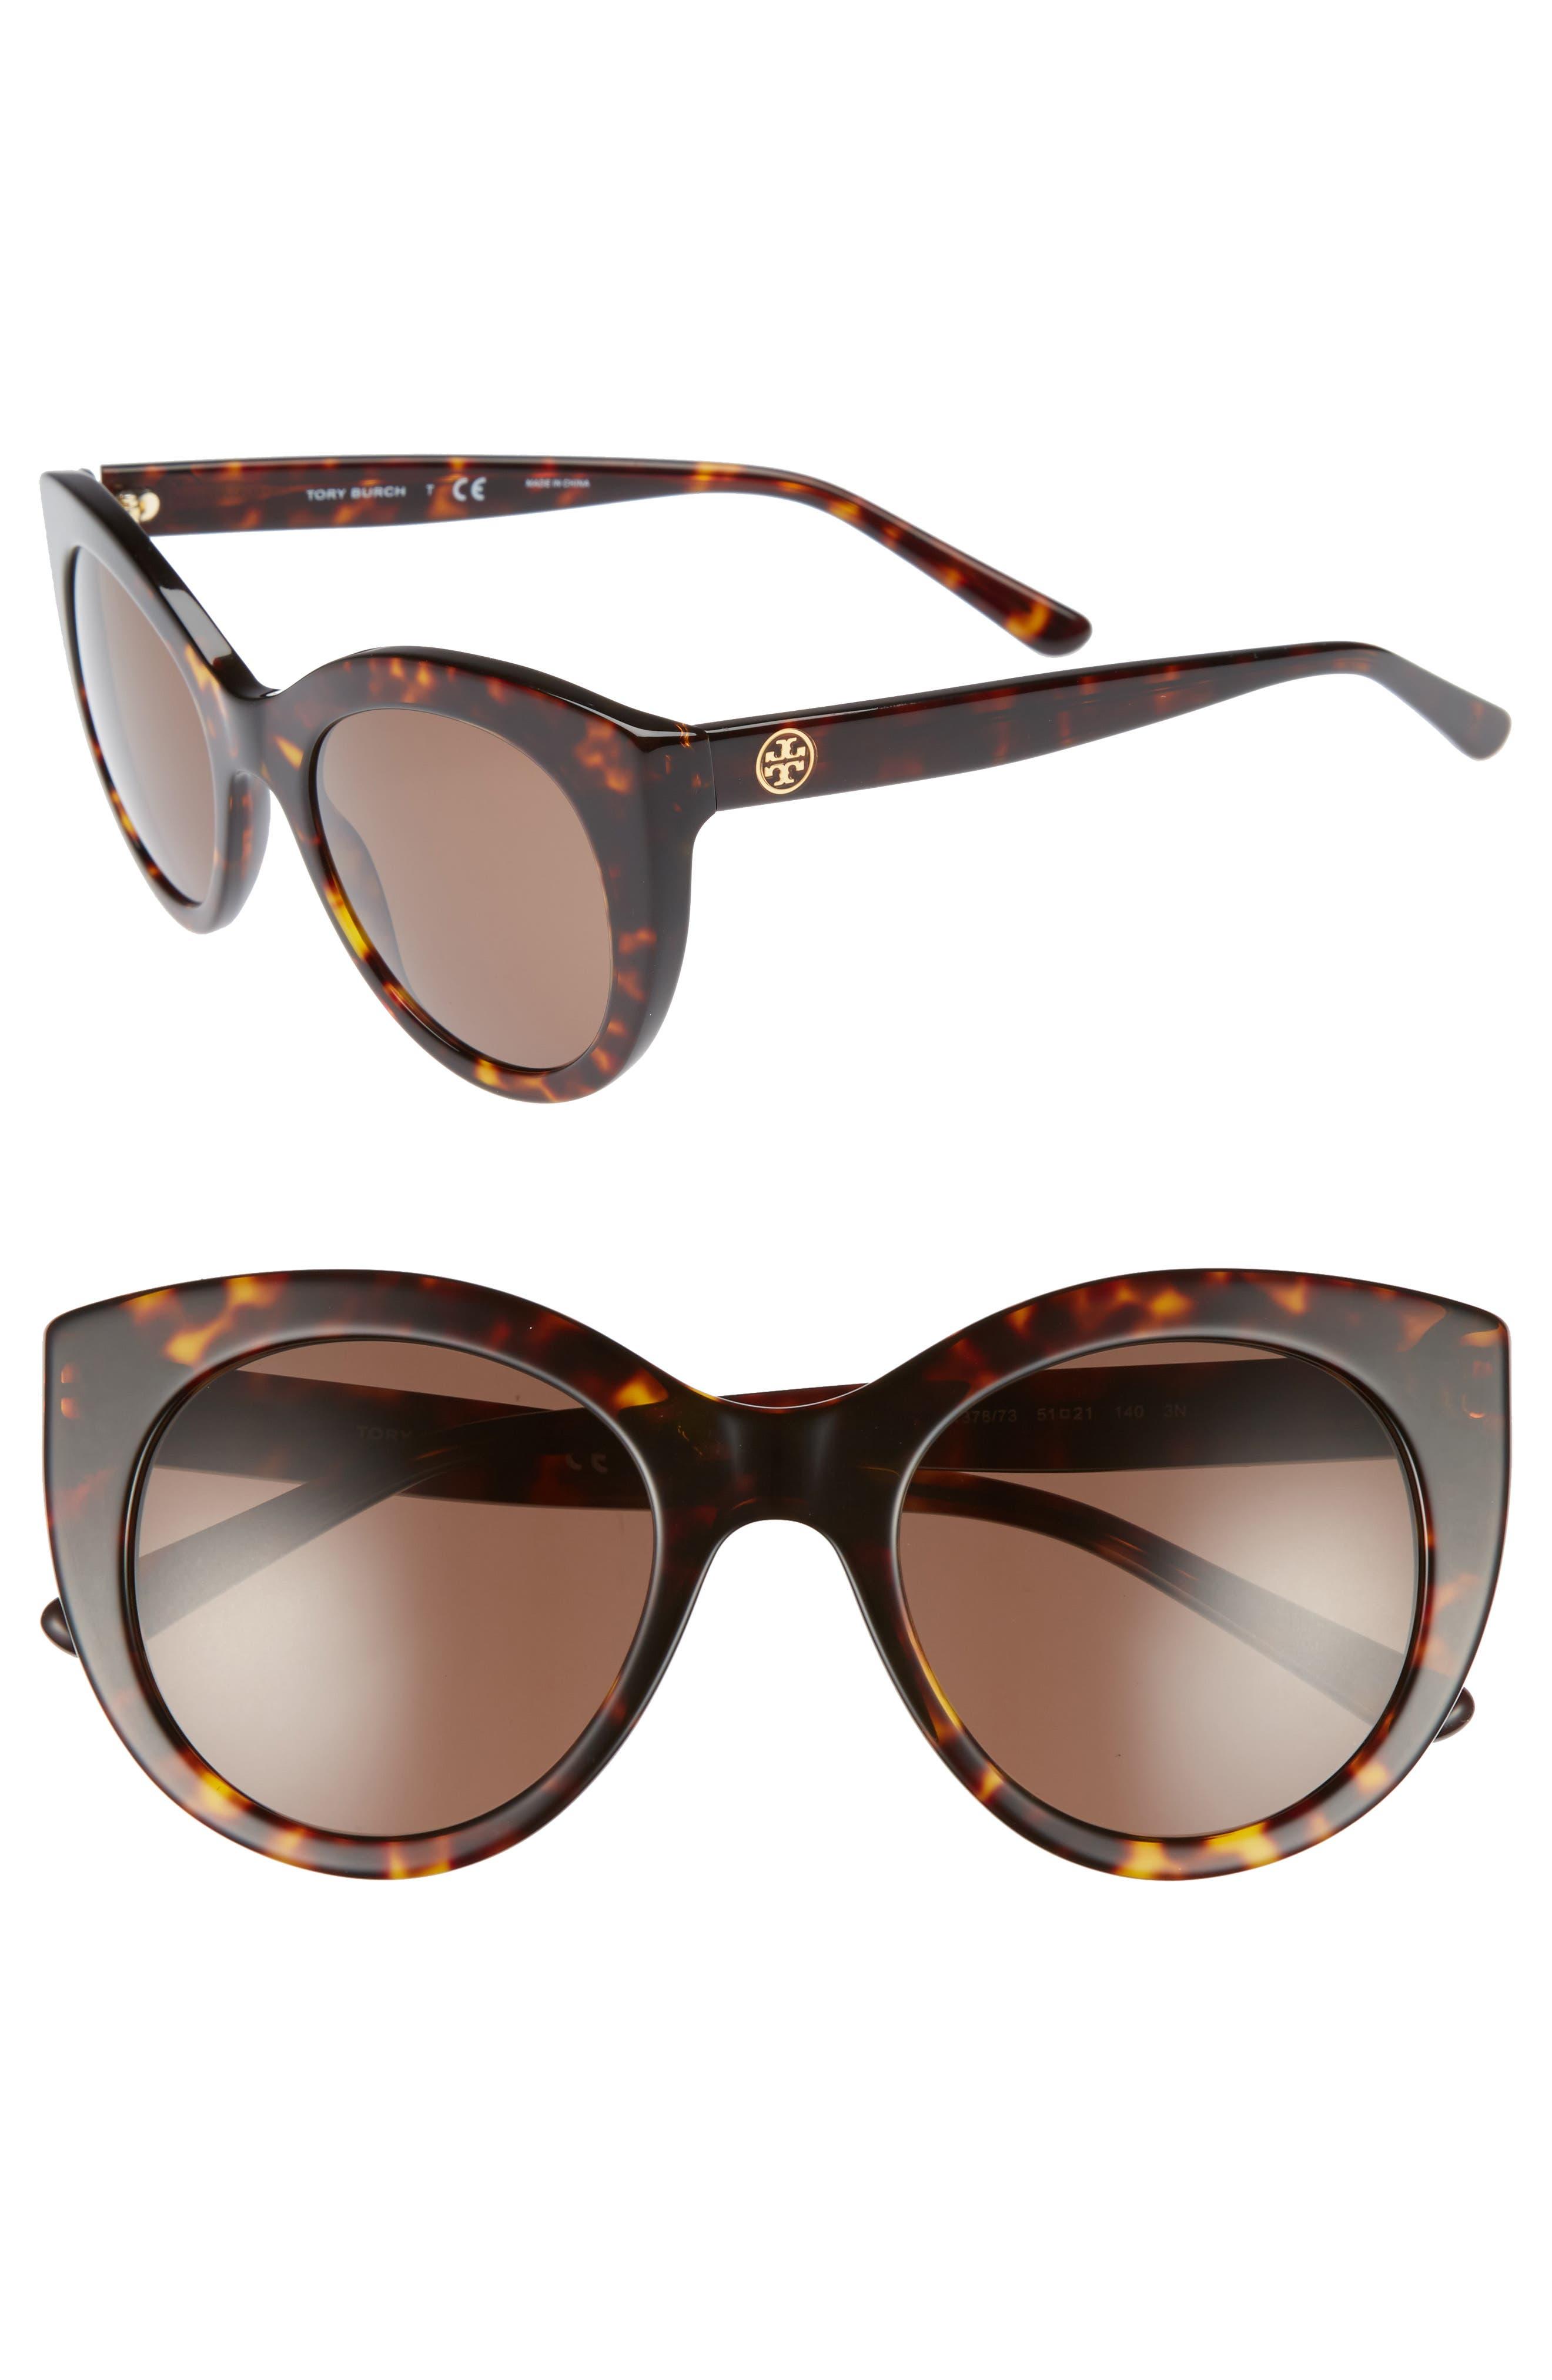 51mm Cat Eye Sunglasses,                             Main thumbnail 1, color,                             Tortoise/ Gold